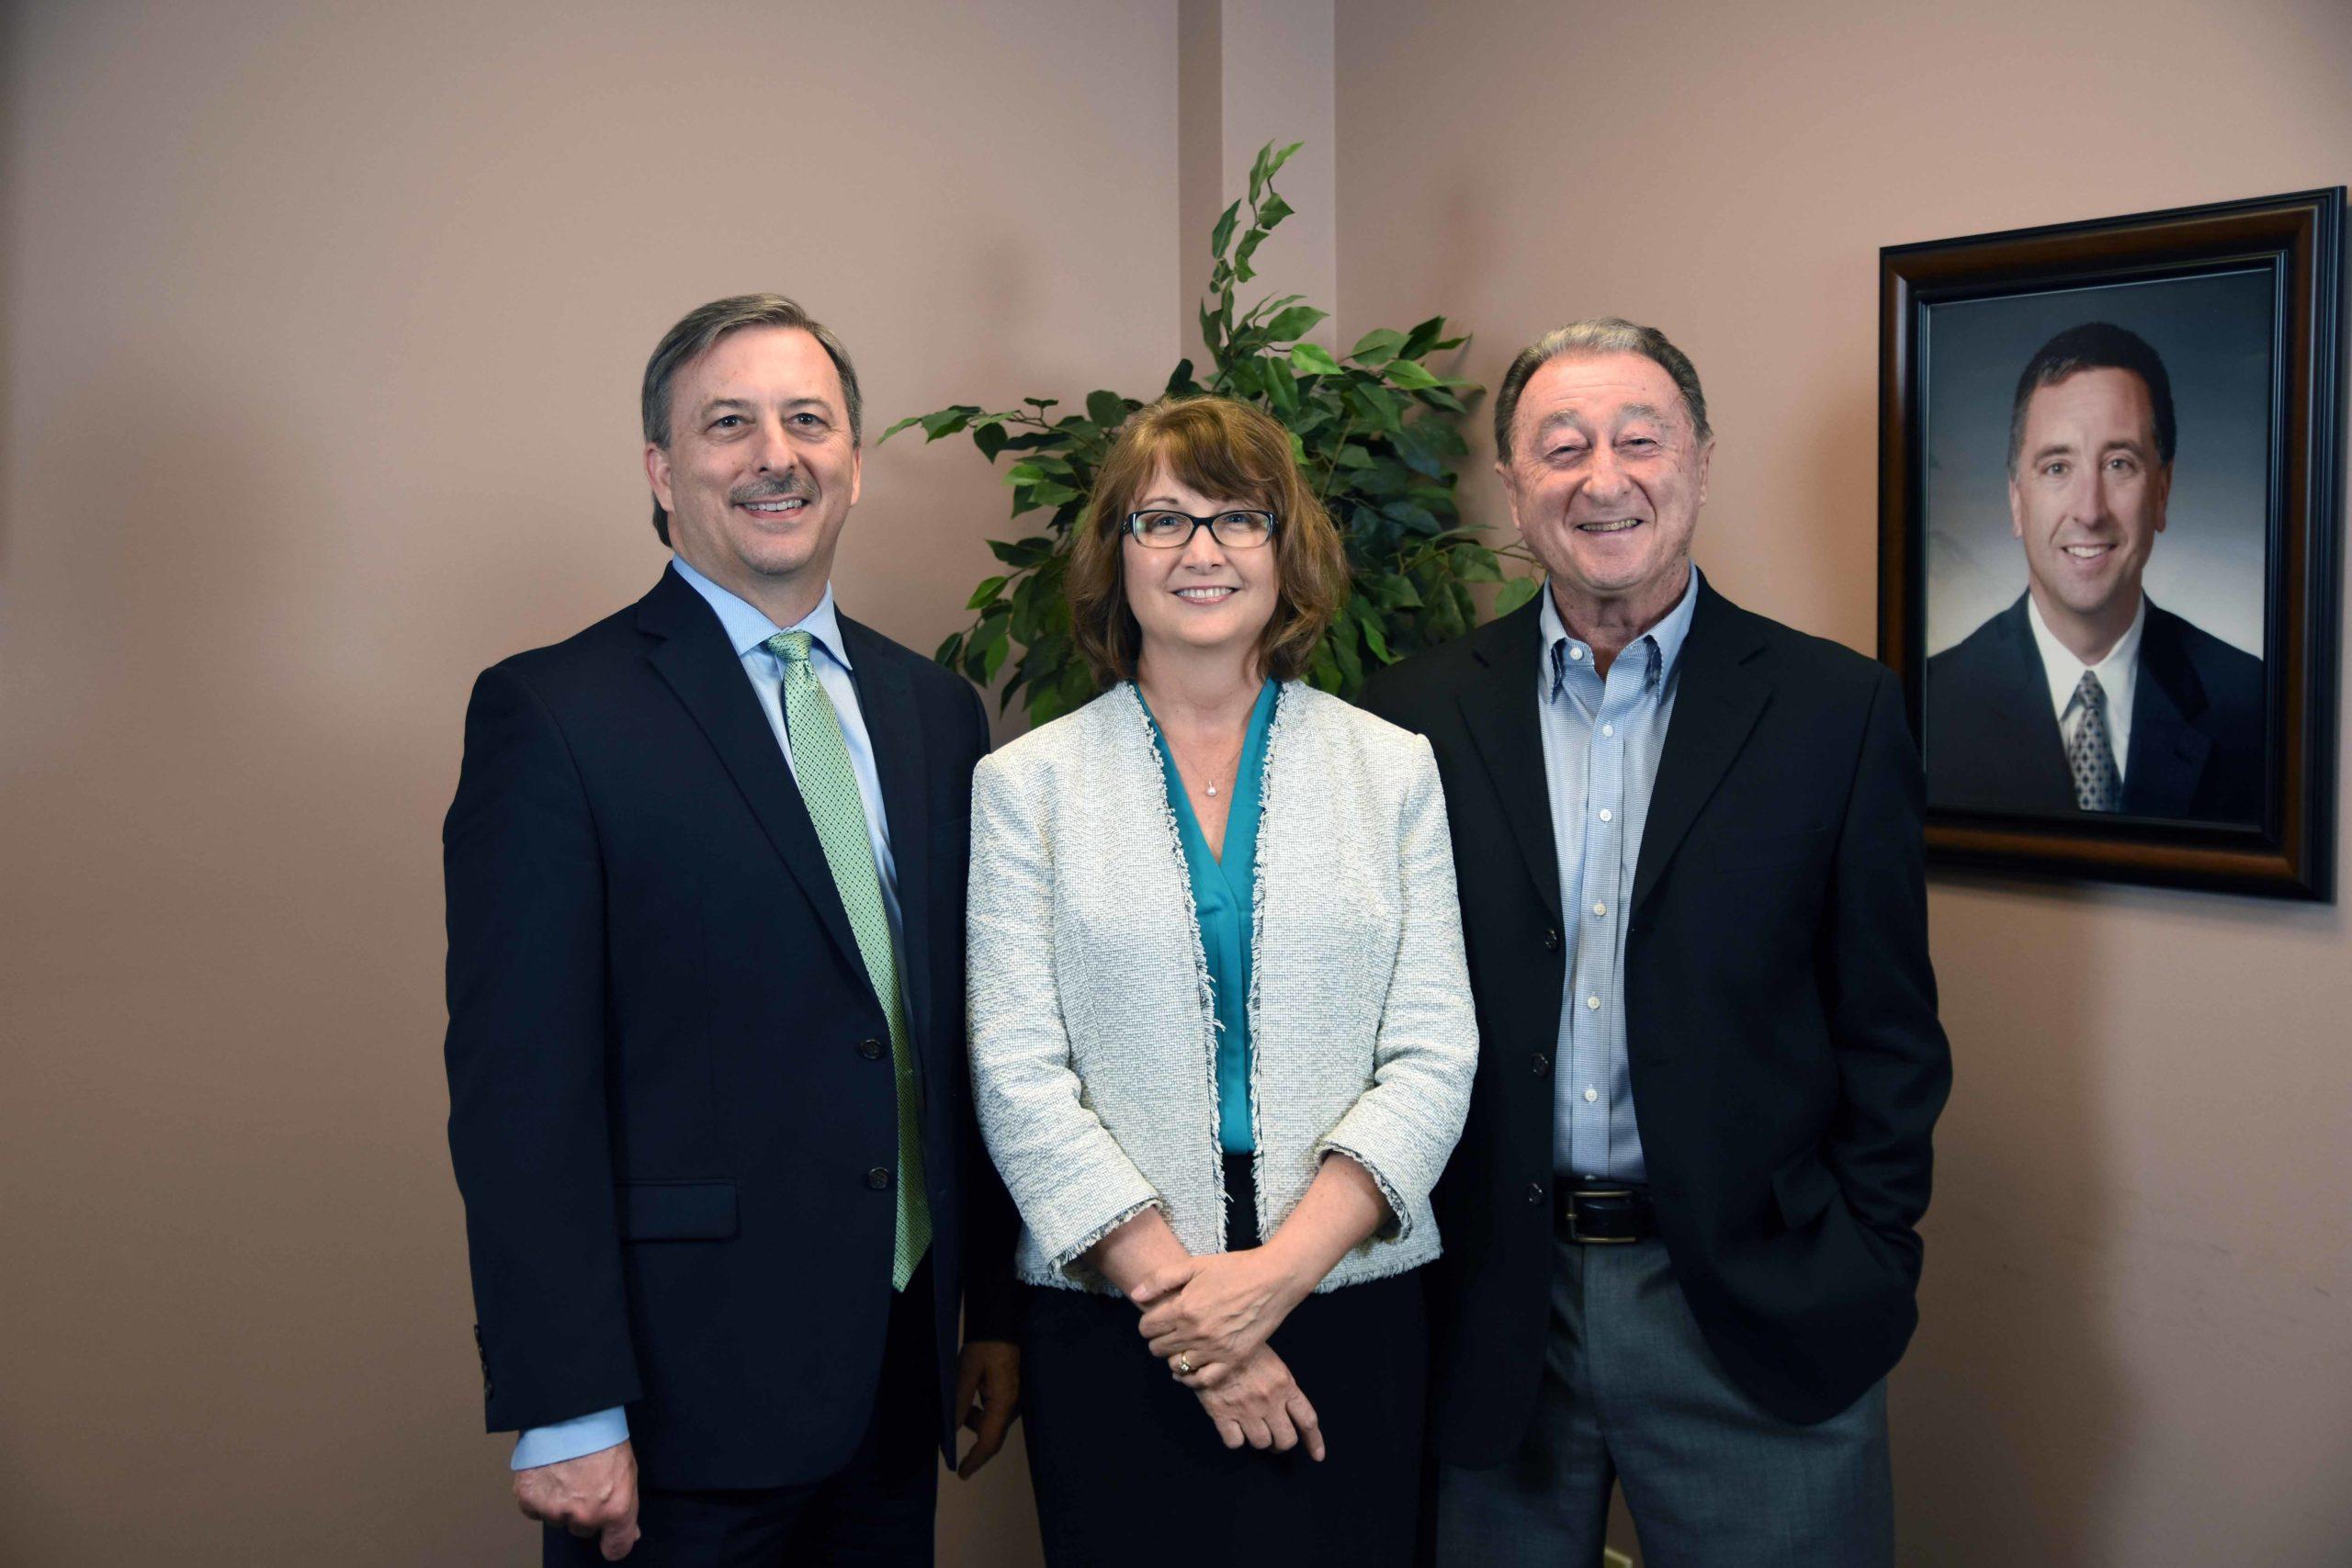 Insurance services in the Cincinnati, Northern KY area